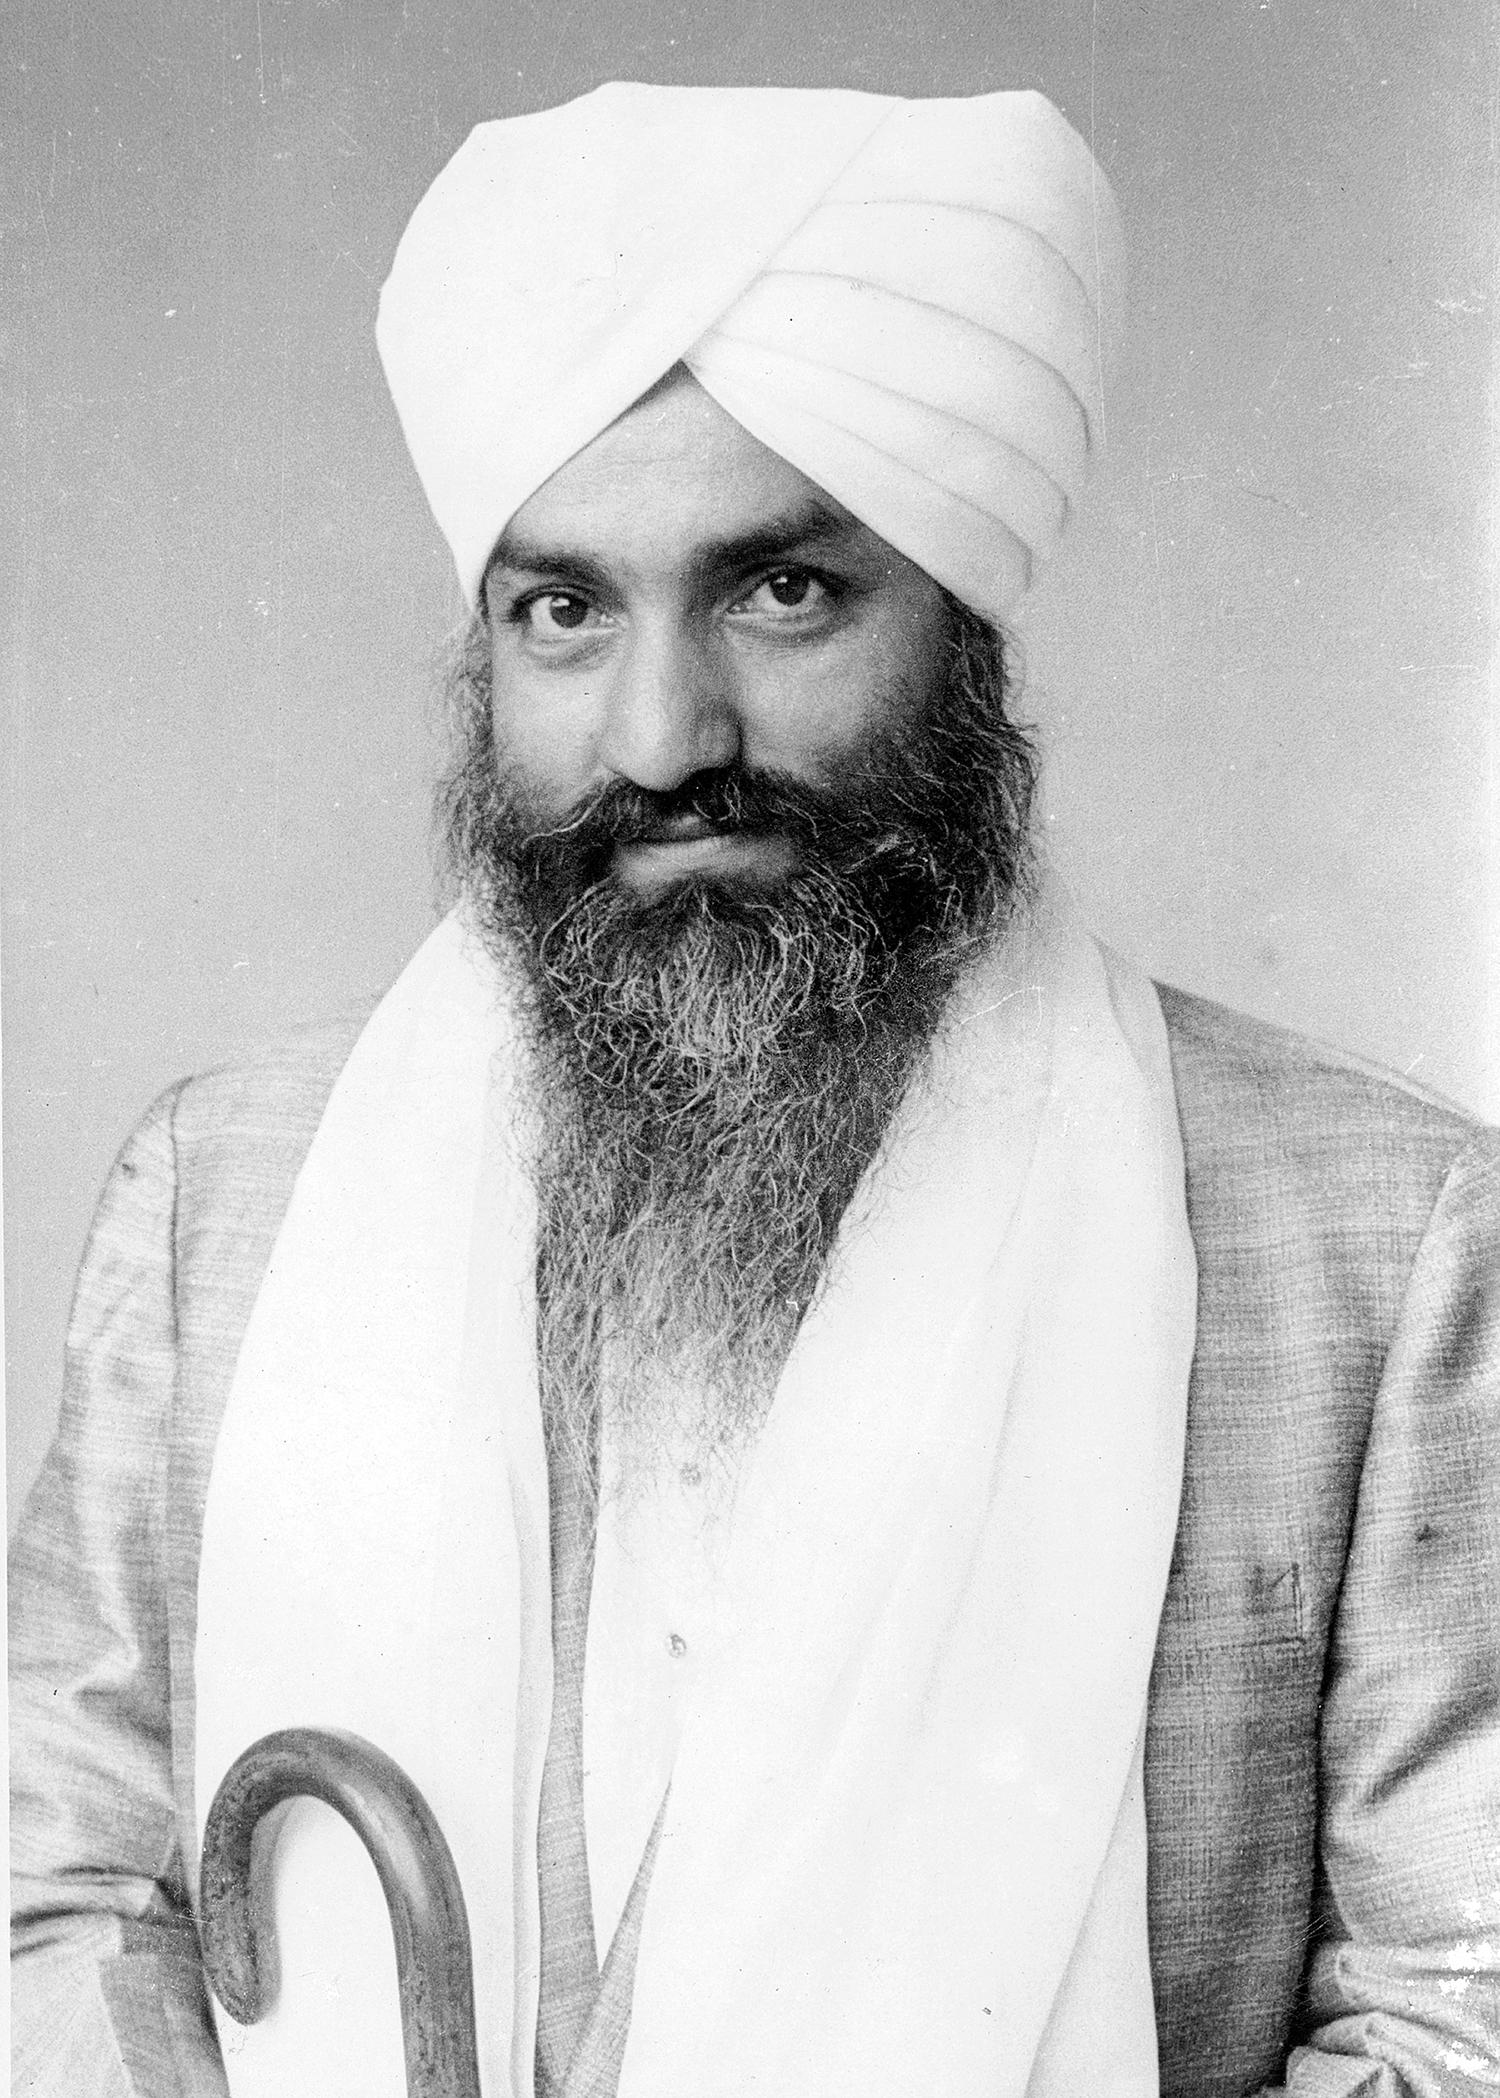 Nirankari Baba Gurbachan Ji Discourses